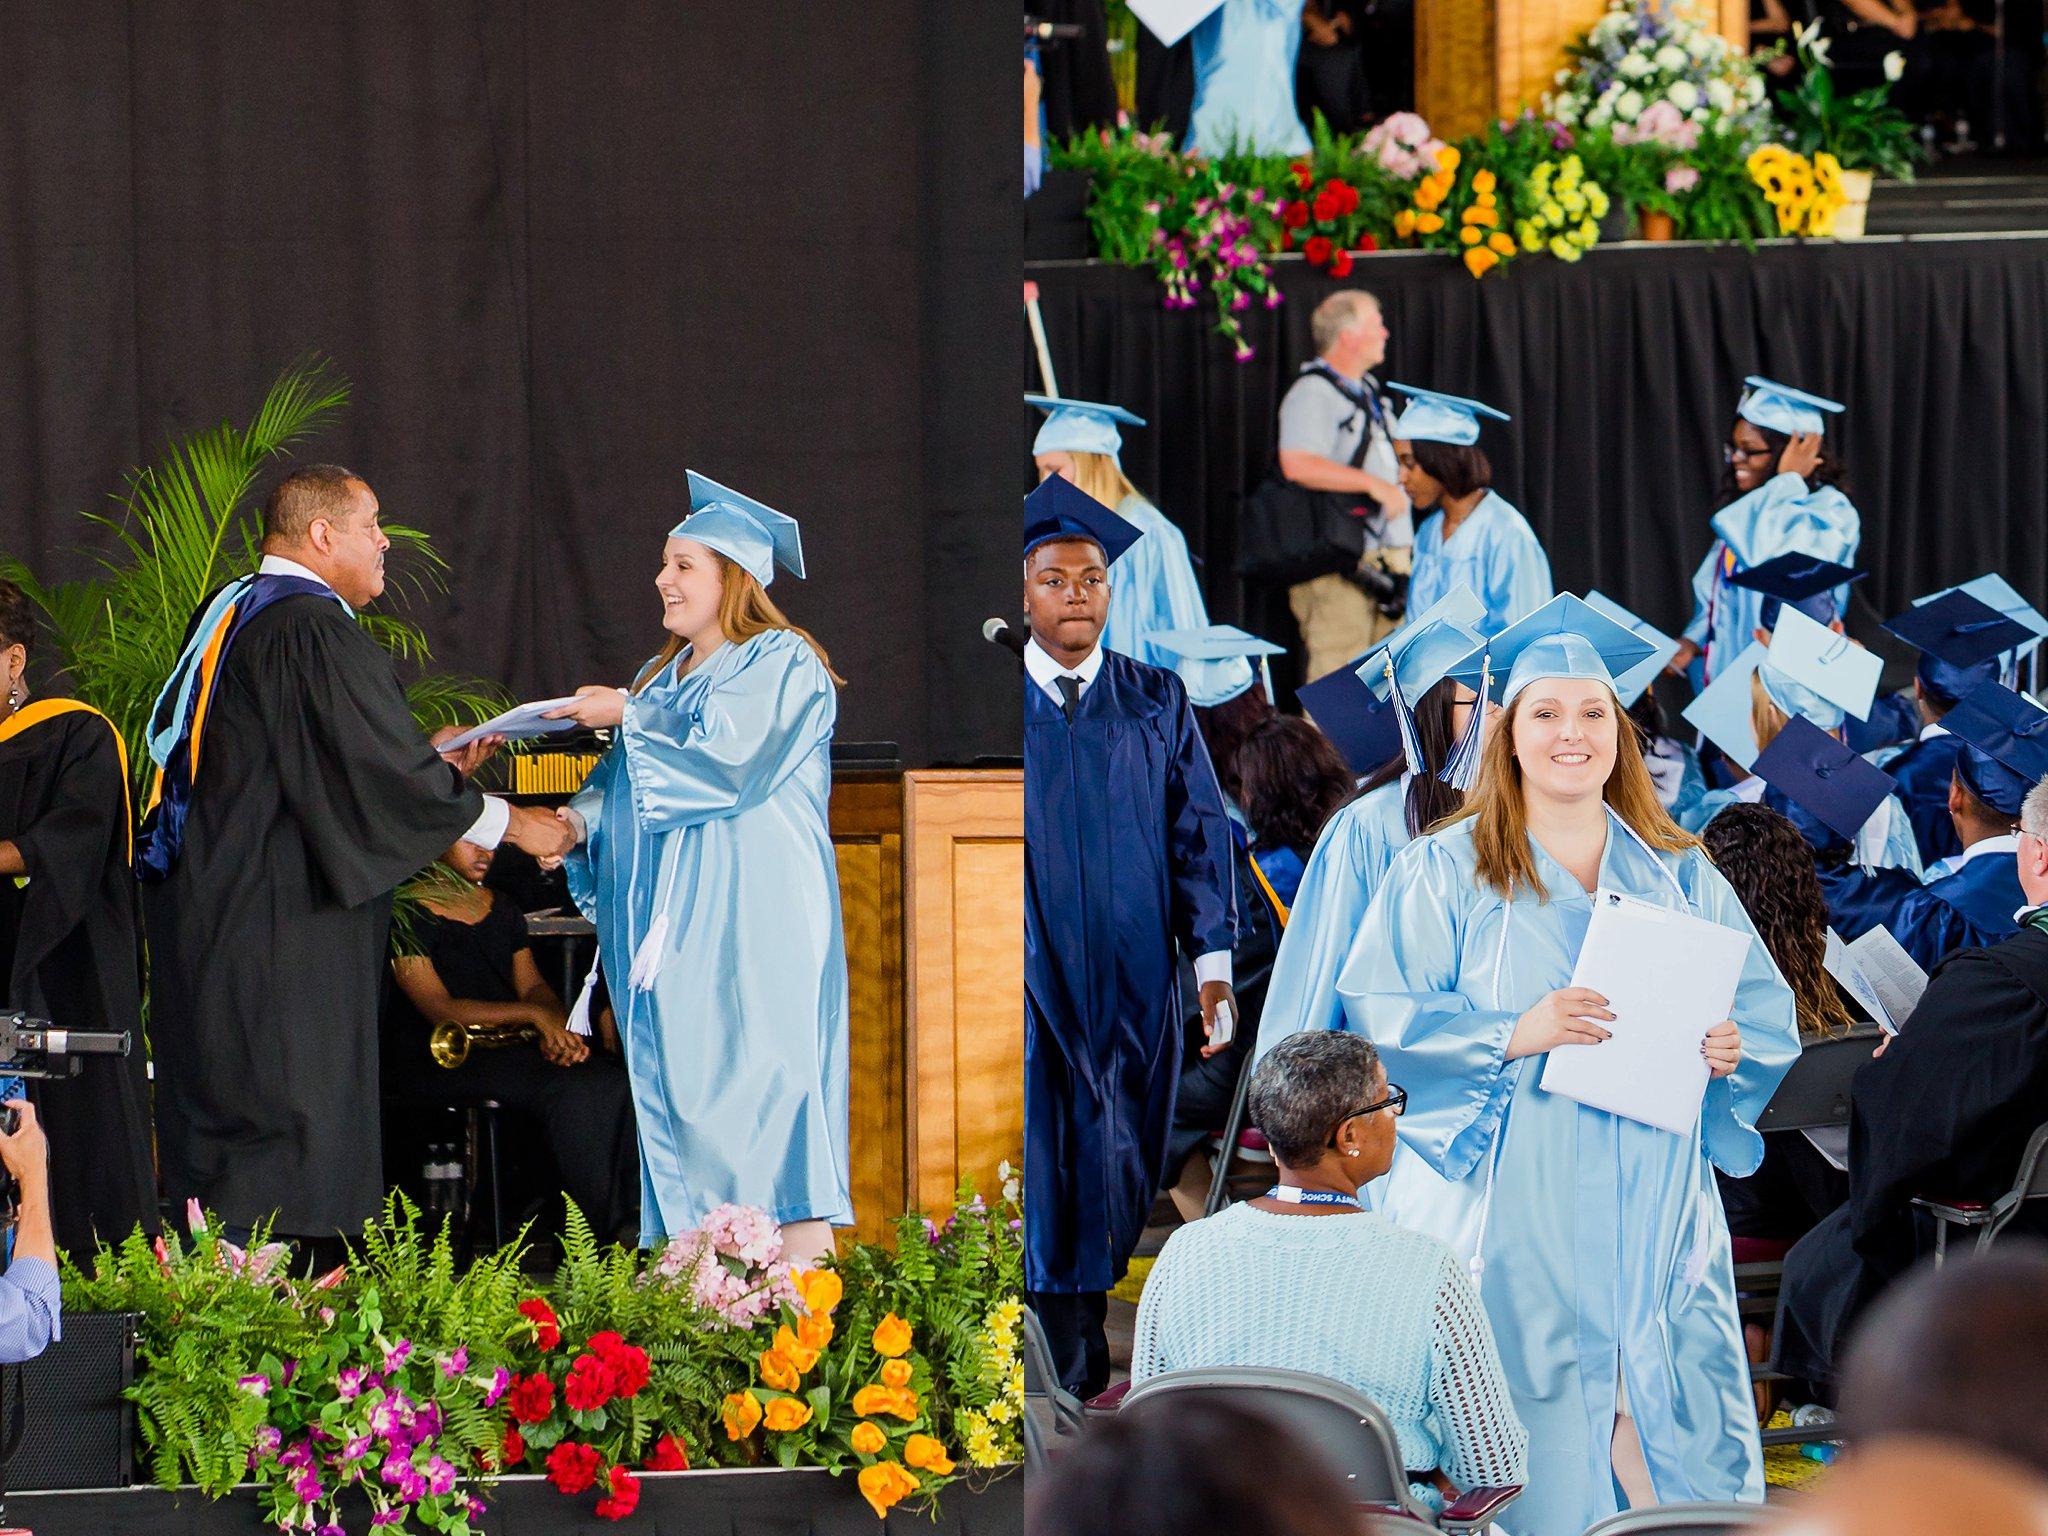 Potomac Senior High School Graduation Class of 2015-6506-2.jpg